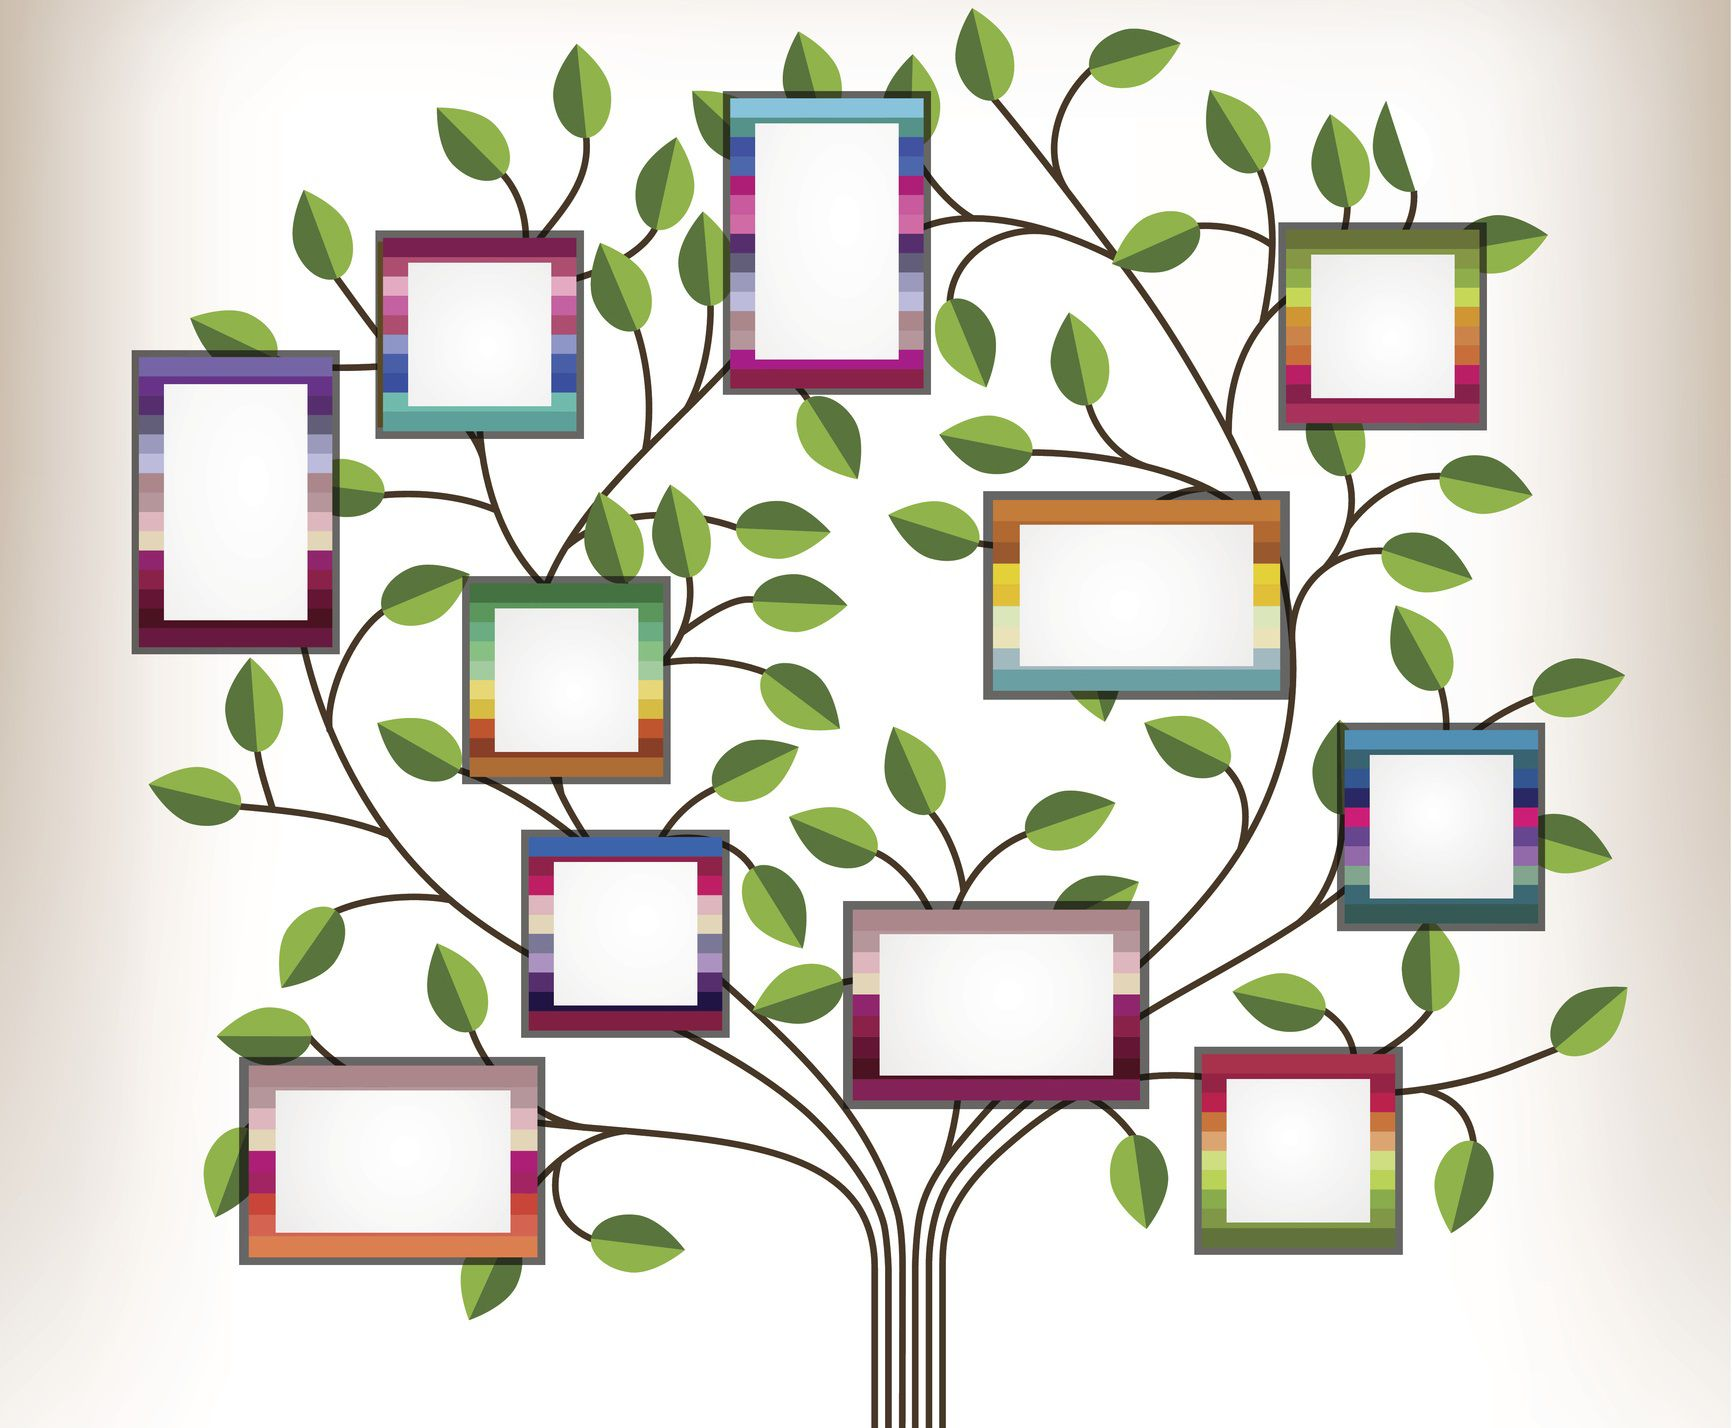 005 Sensational Family Tree For Baby Book Template Inspiration  PrintableFull